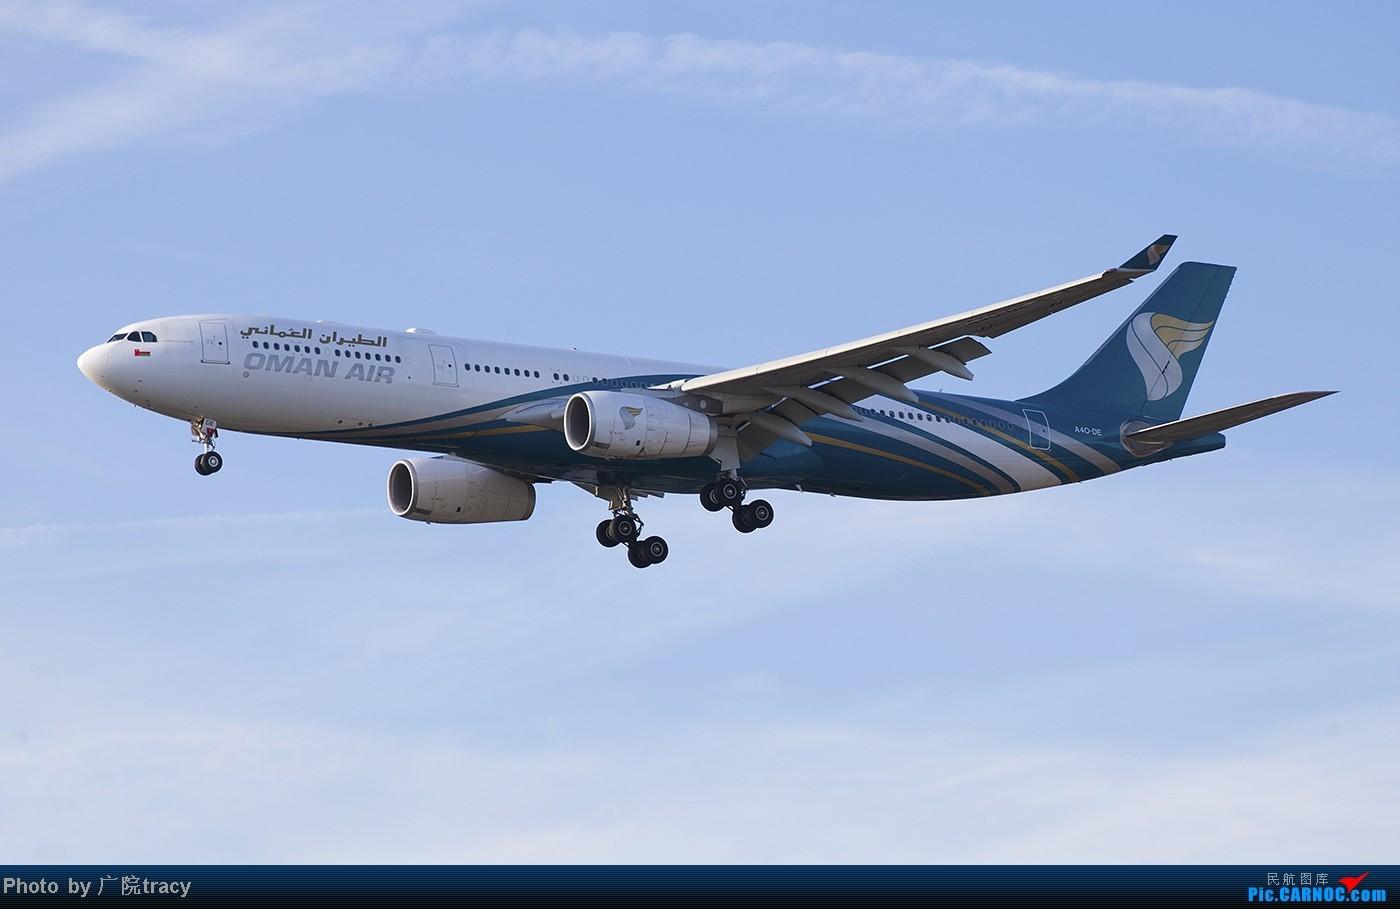 Re:[原创]★ ★ ★ ★ ★中东的航空公司在伦敦希斯罗国际机场  ★ ★ ★ ★ ★ AIRBUS A330-300 A4O-DE 英国伦敦希思罗机场